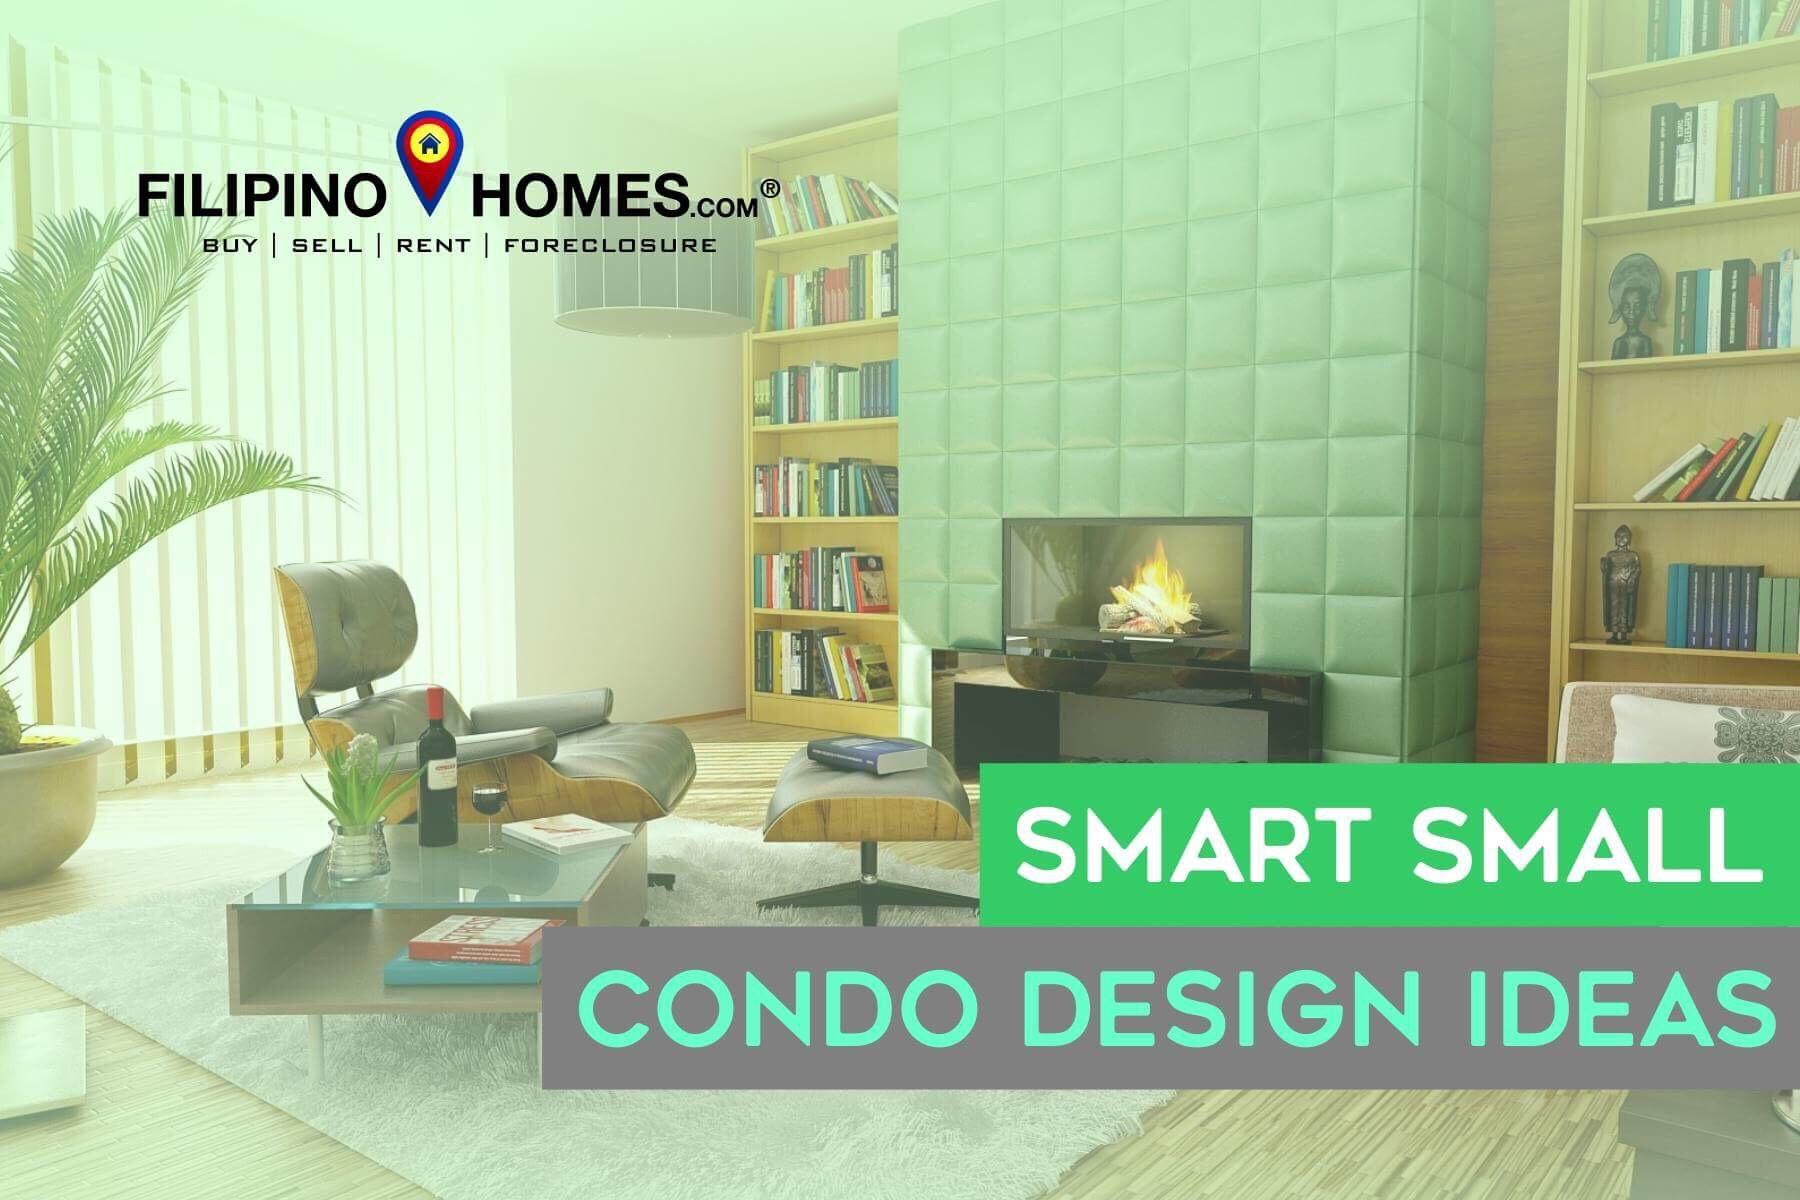 Home Interior Design Ideas For Small Spaces Philippines